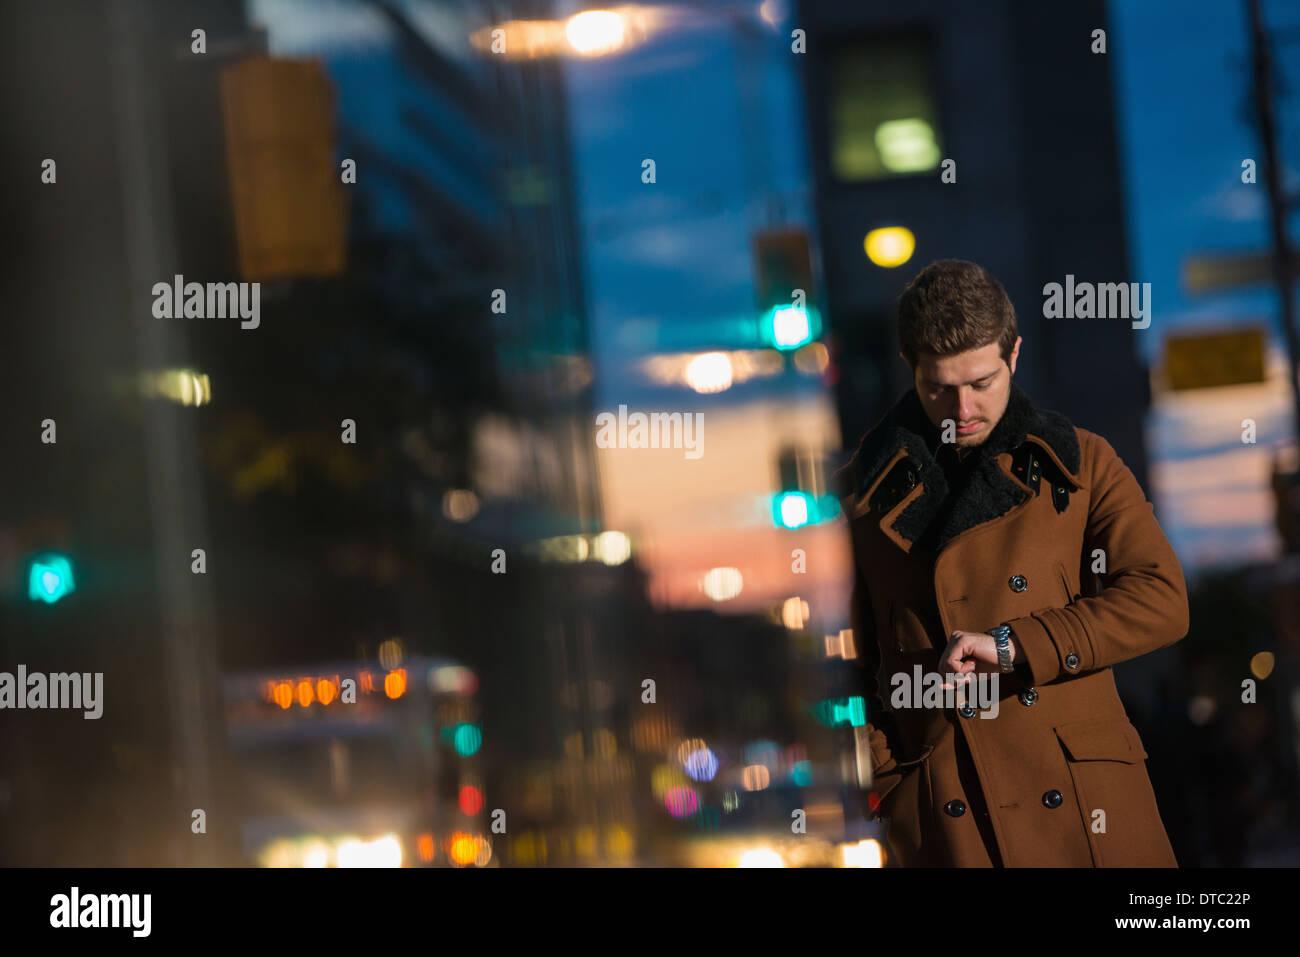 Joven esperando en la calle mirando a ver, Toronto, Ontario, Canadá Imagen De Stock